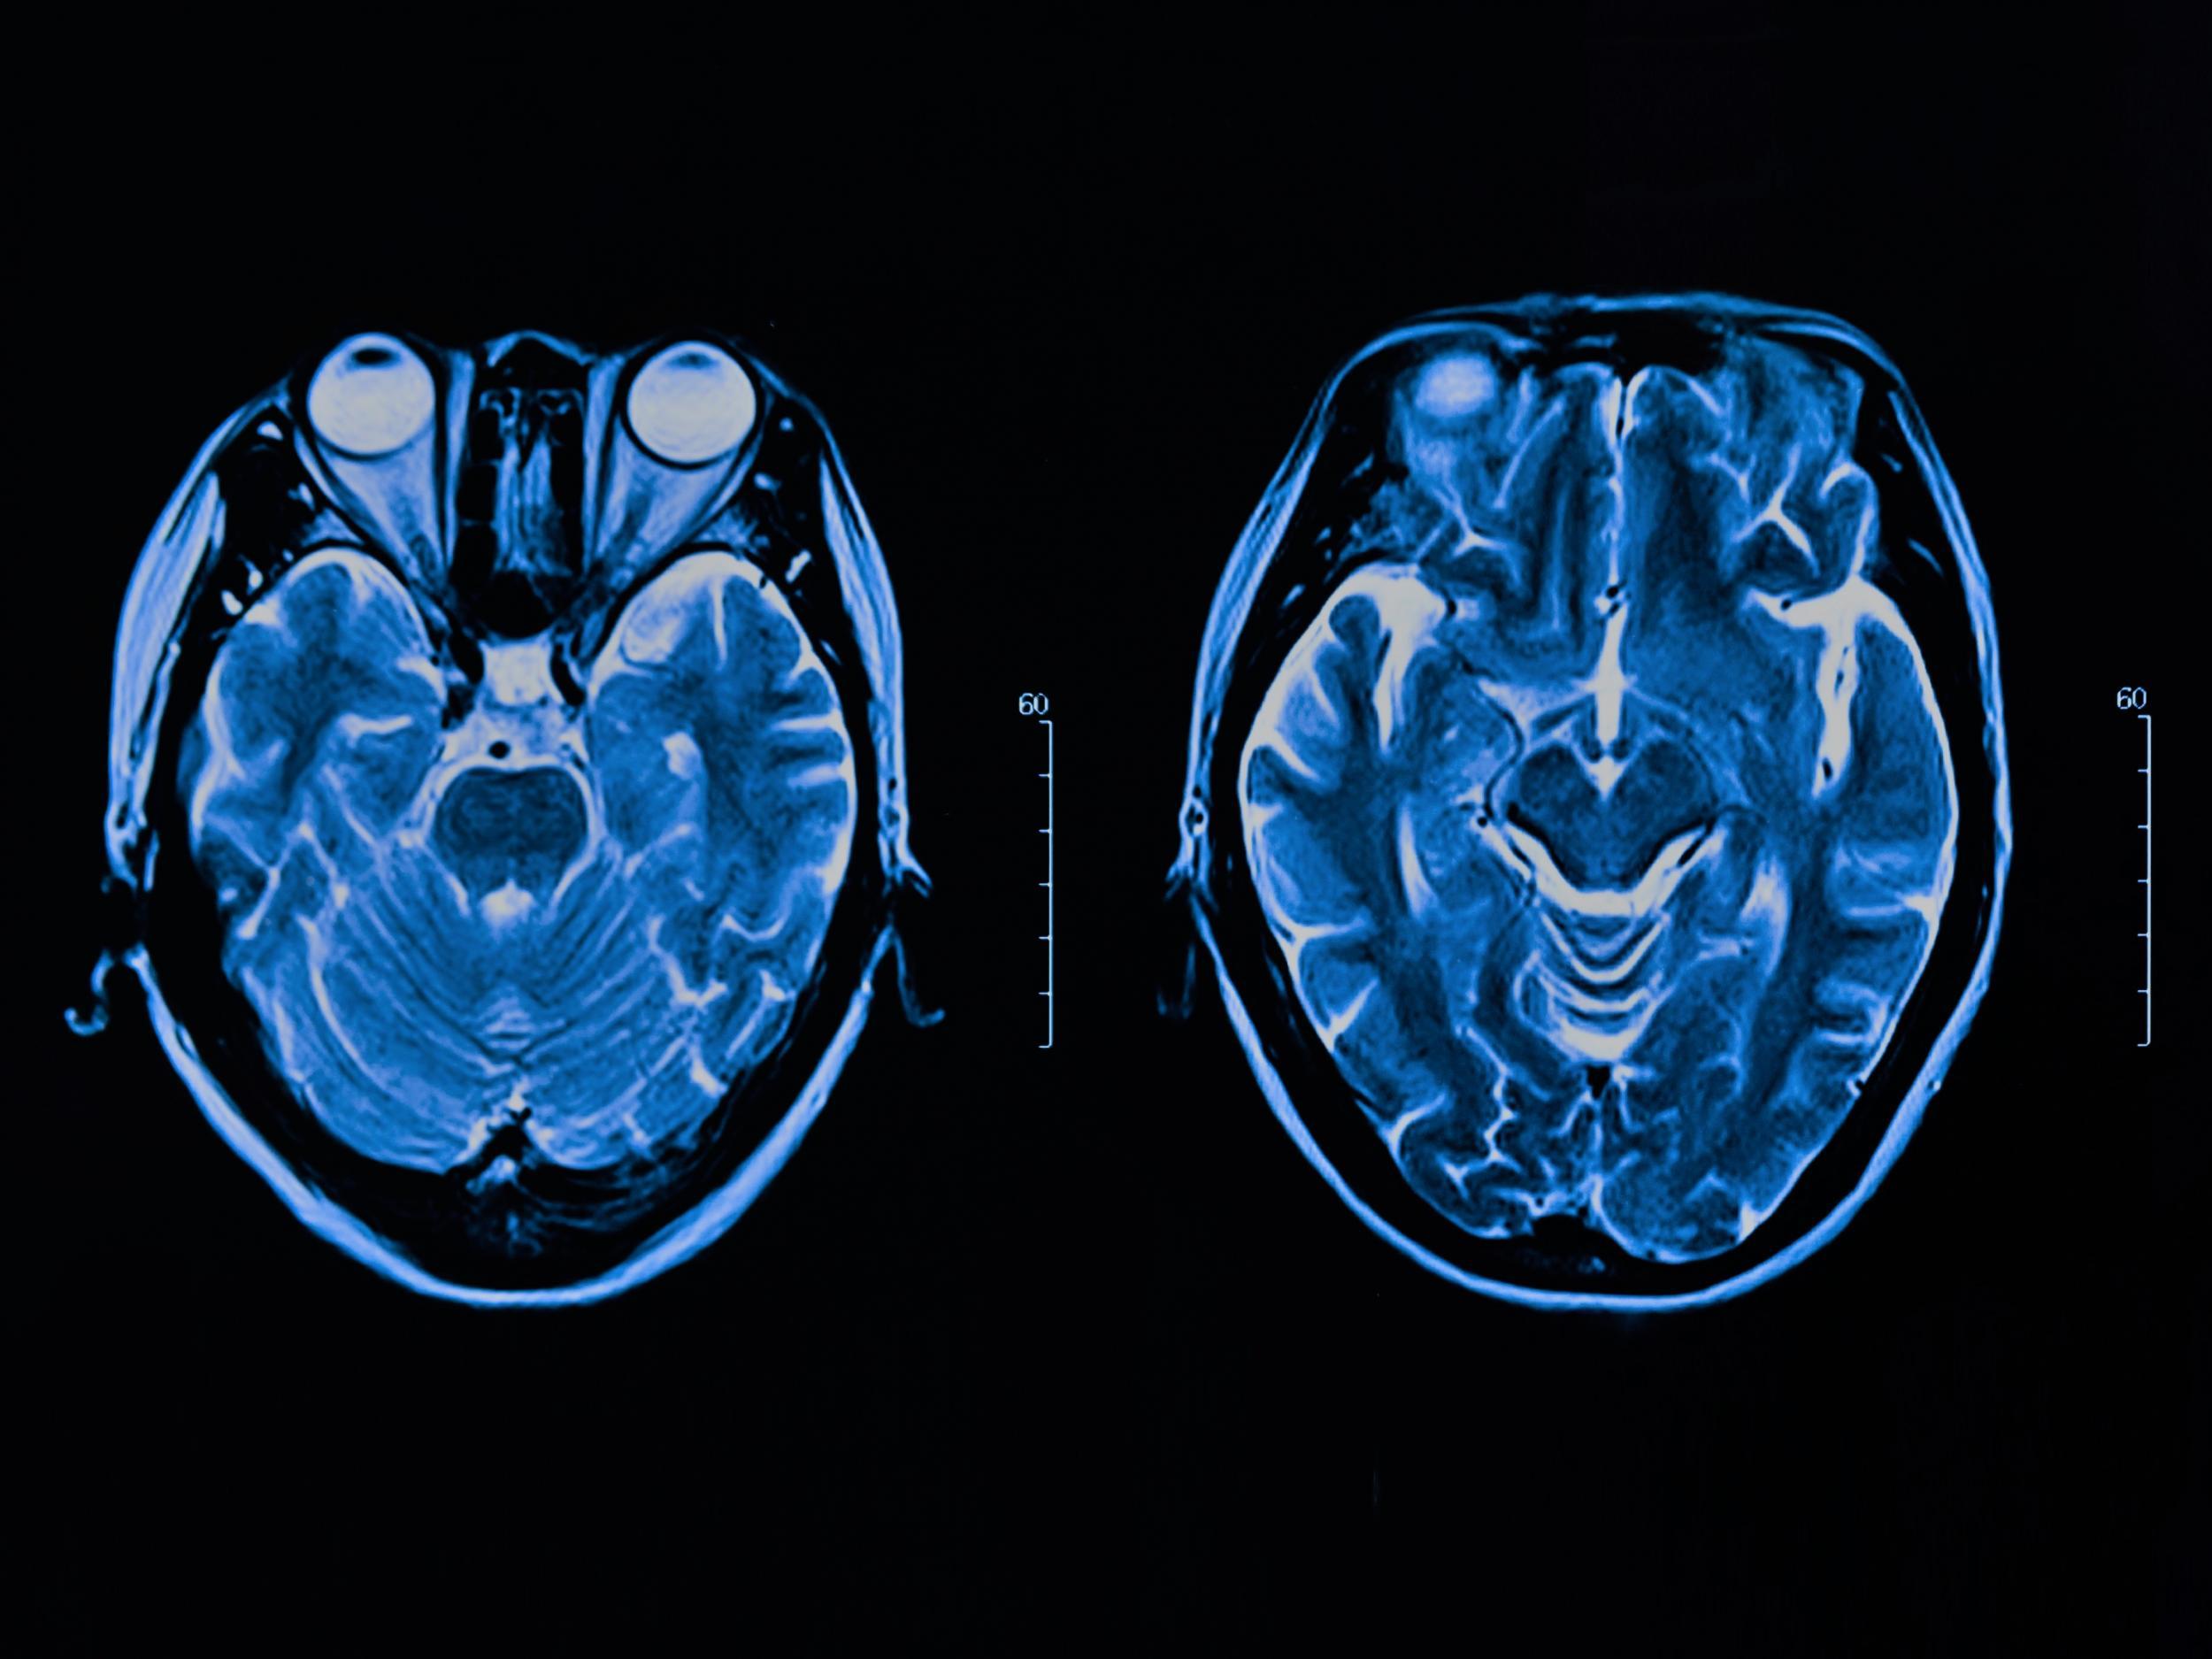 Artificial intelligence: DeepMind unlocks secrets of human brain using AI learning technique